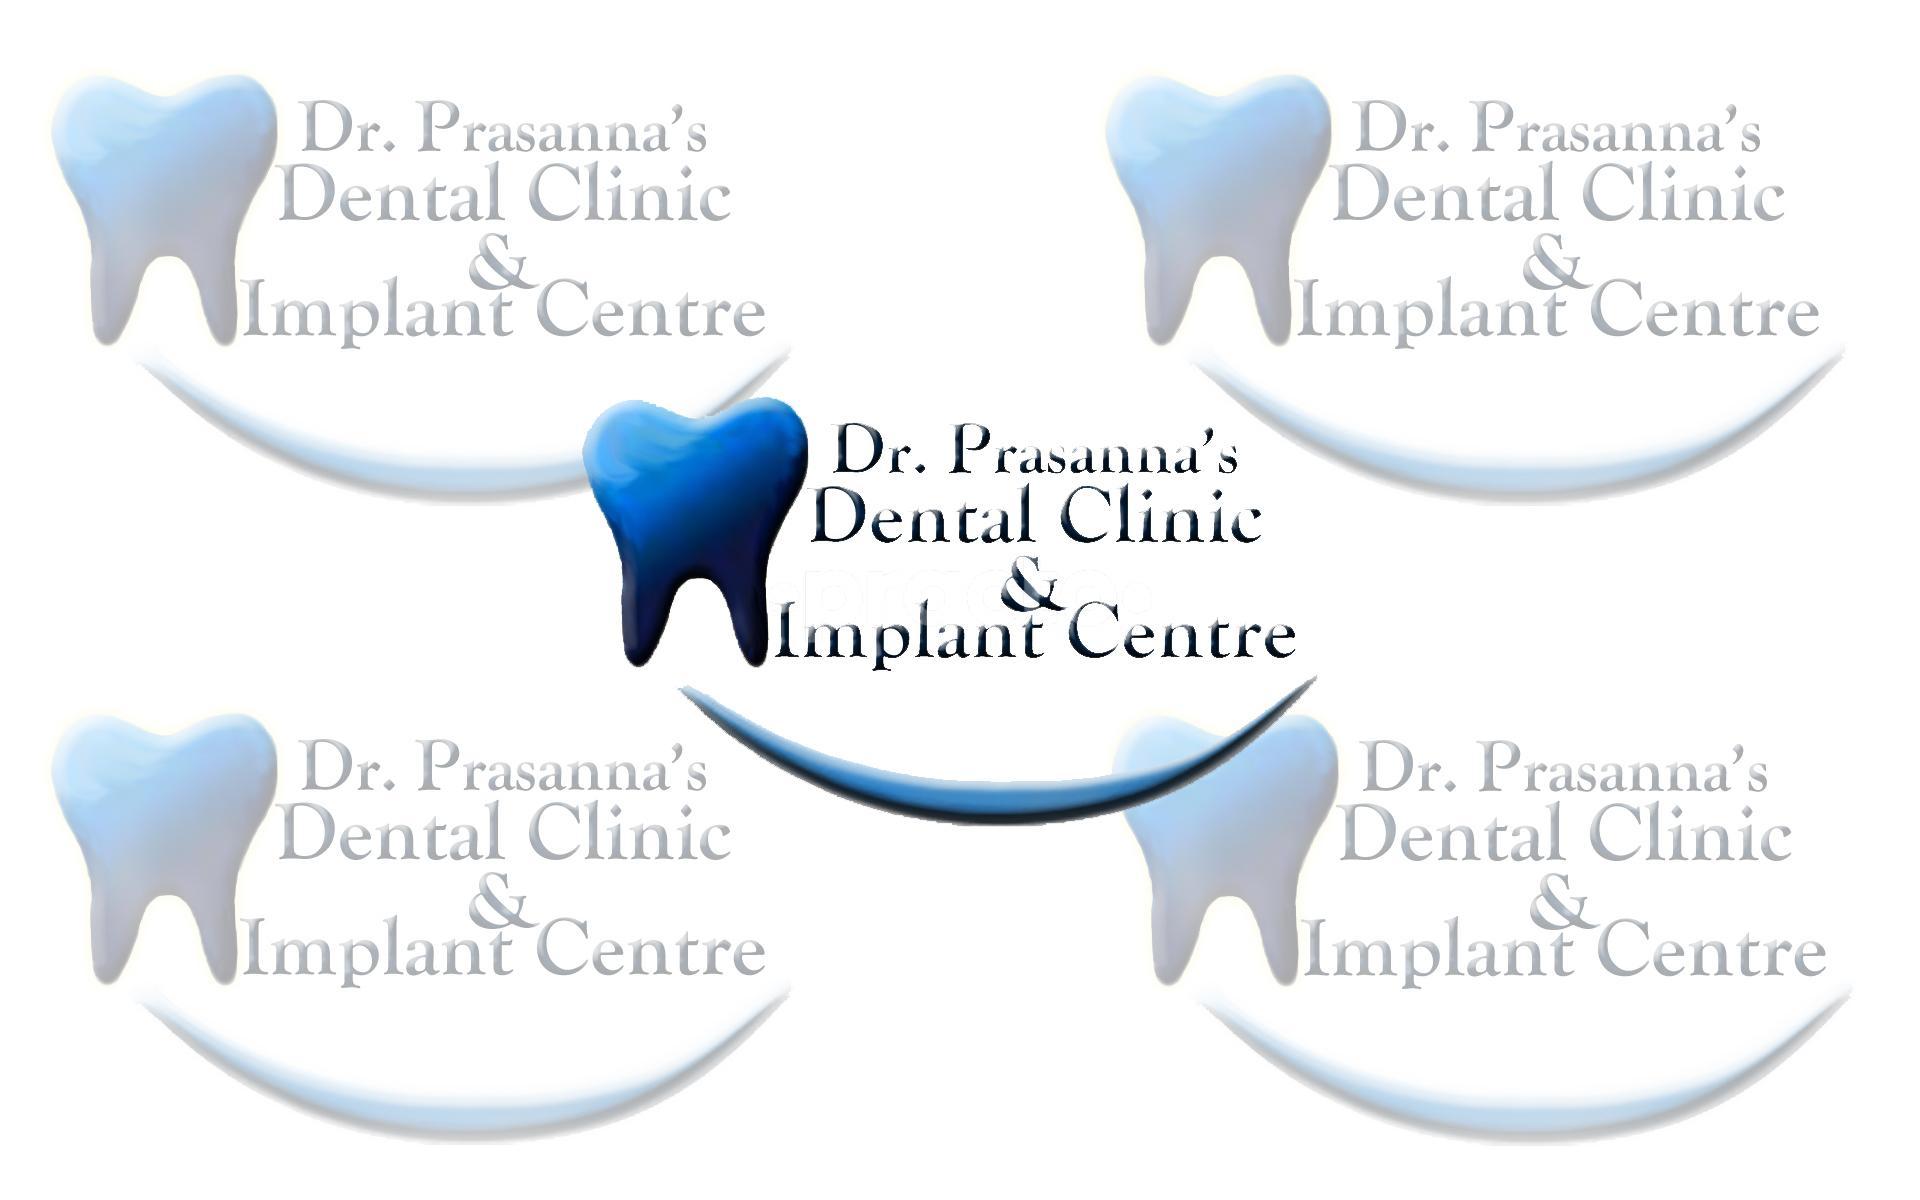 Dr.Prasanna Dental Clinic & Implant Centre